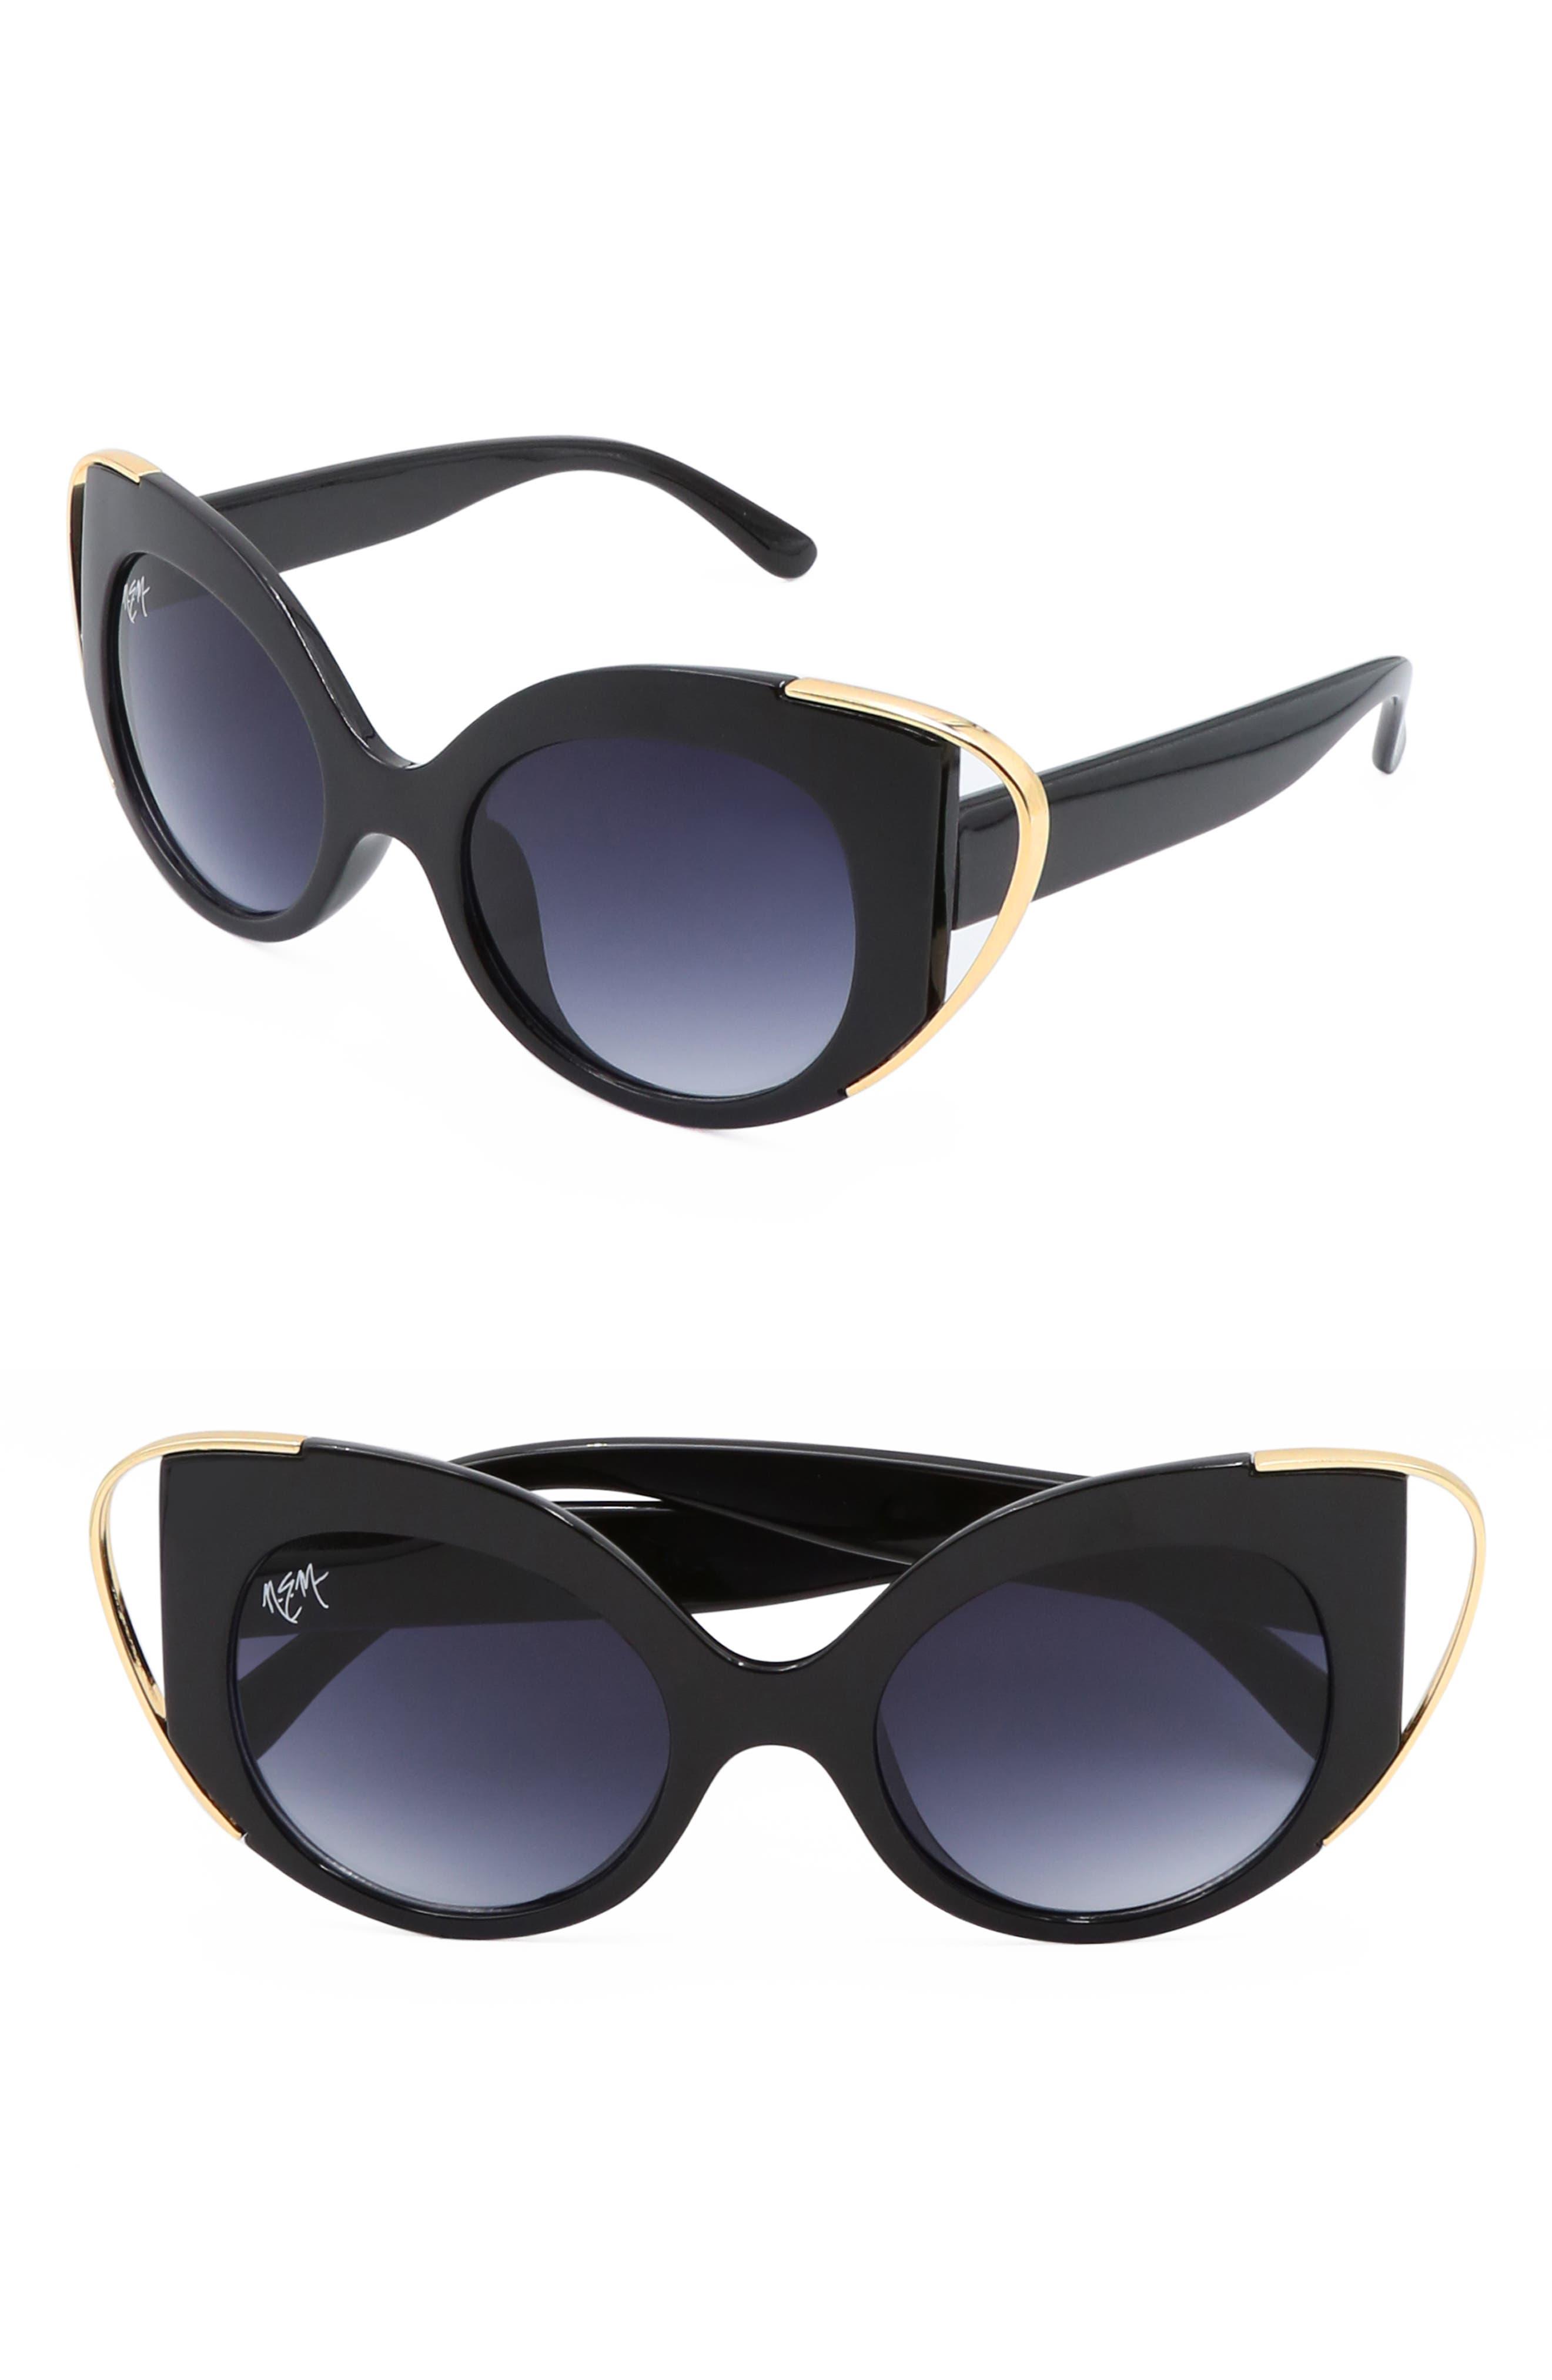 Audrey 50mm Cutout Cat Eye Sunglasses,                             Main thumbnail 1, color,                             BLACK W DARK LENS